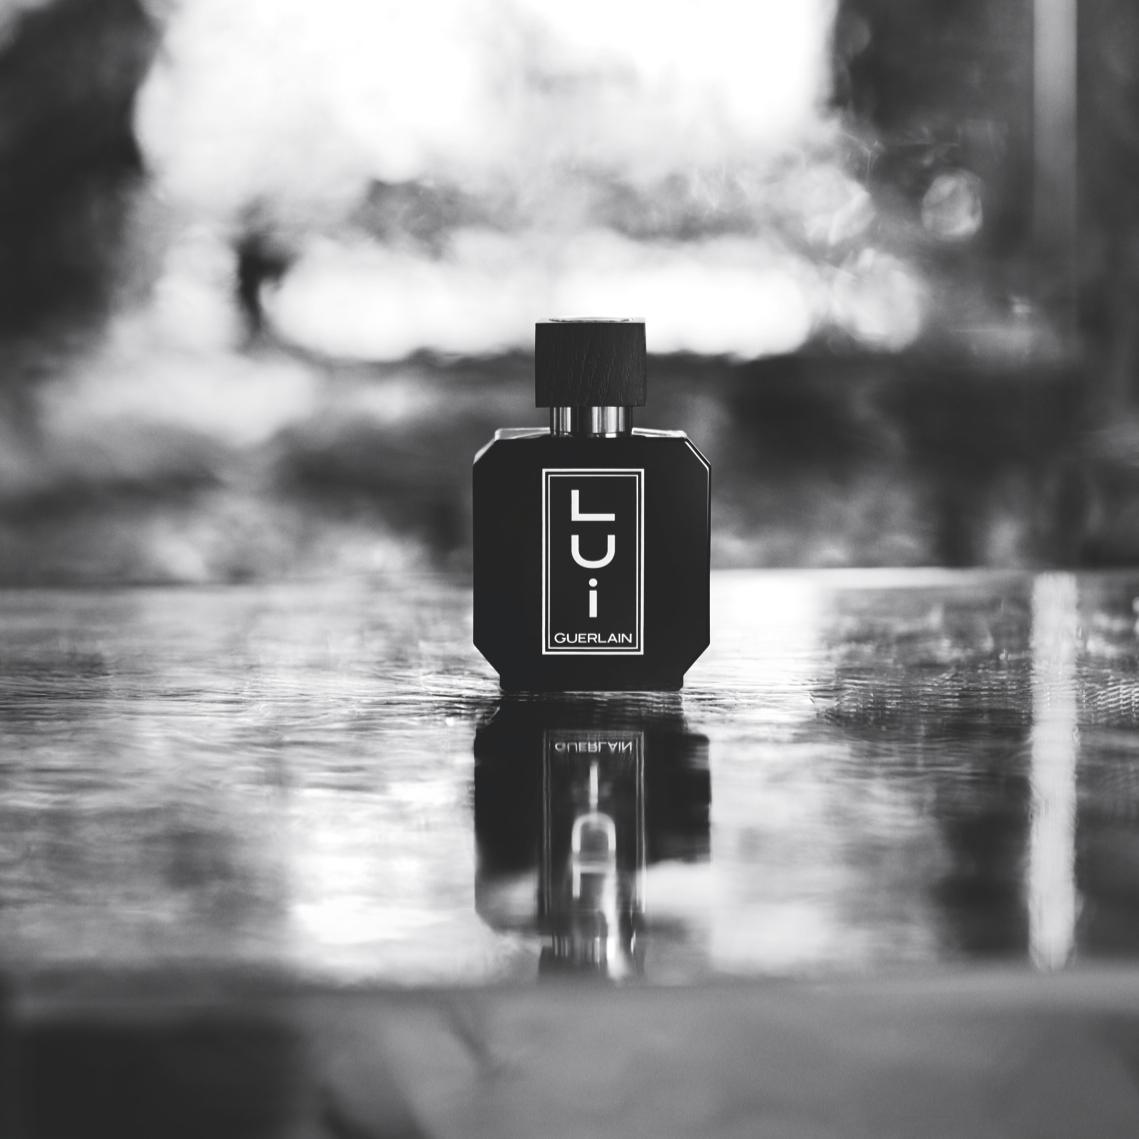 5d62e6f20fe8 LUI Guerlain perfume - a new fragrance for women and men 2017